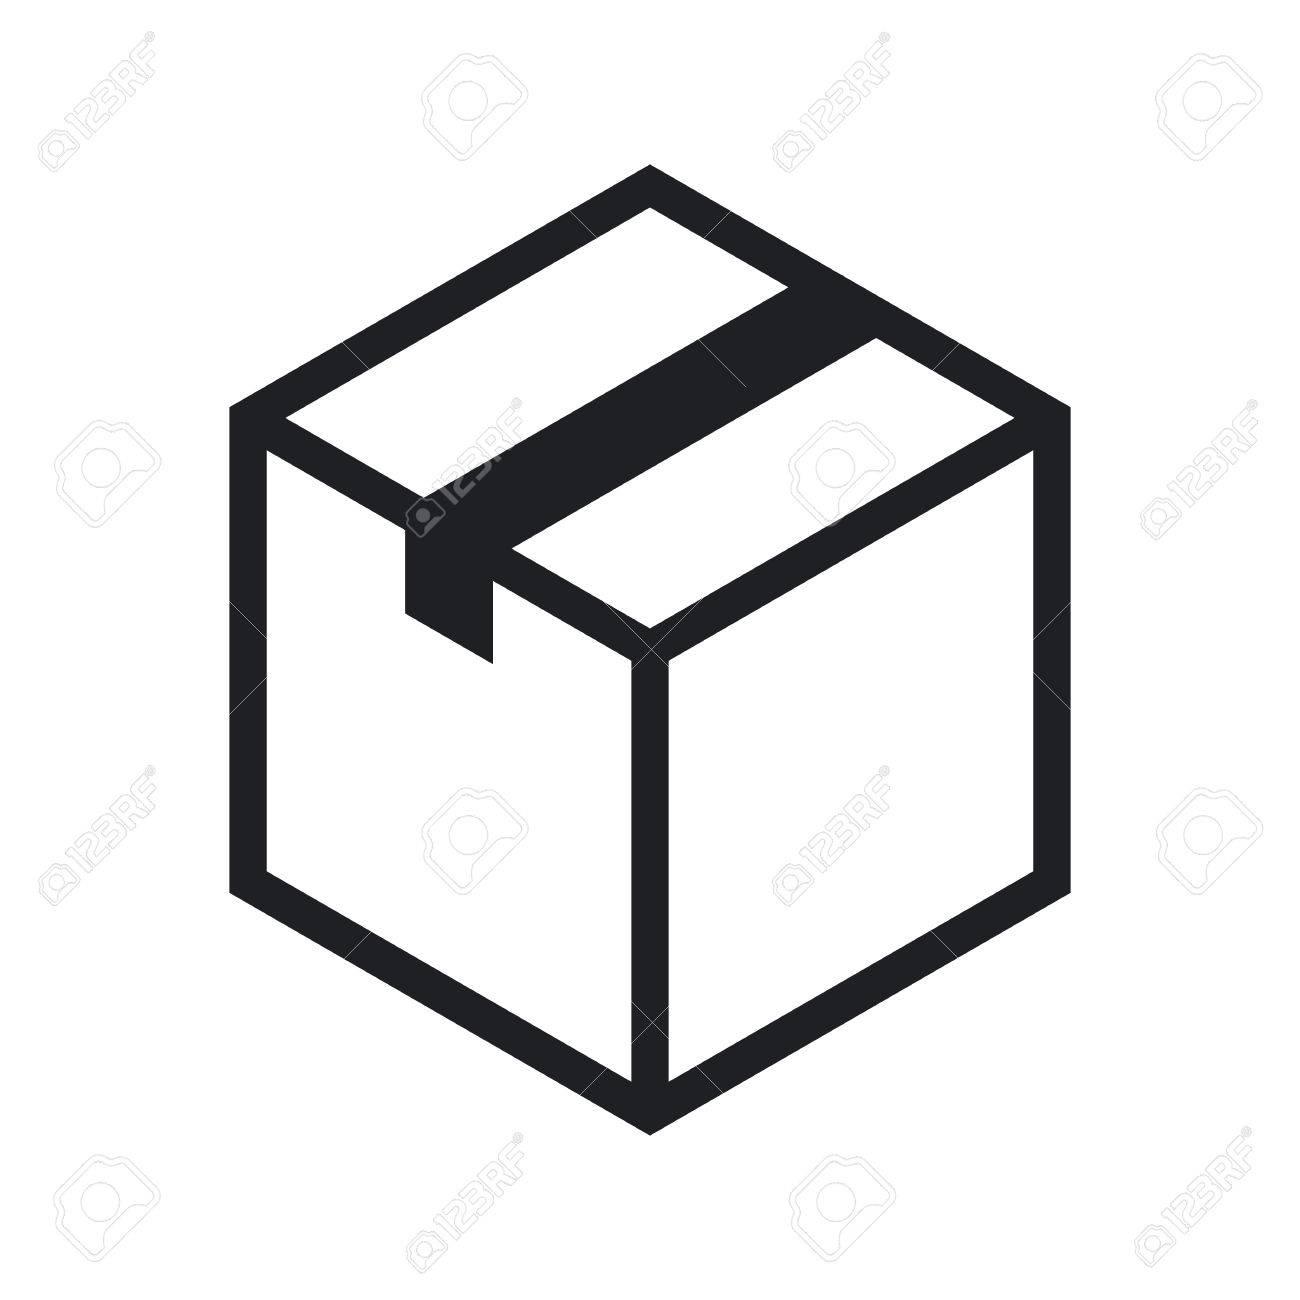 isometric cardboard box outline icon modern minimal flat design rh 123rf com box vector cranks m30-p box vector icon